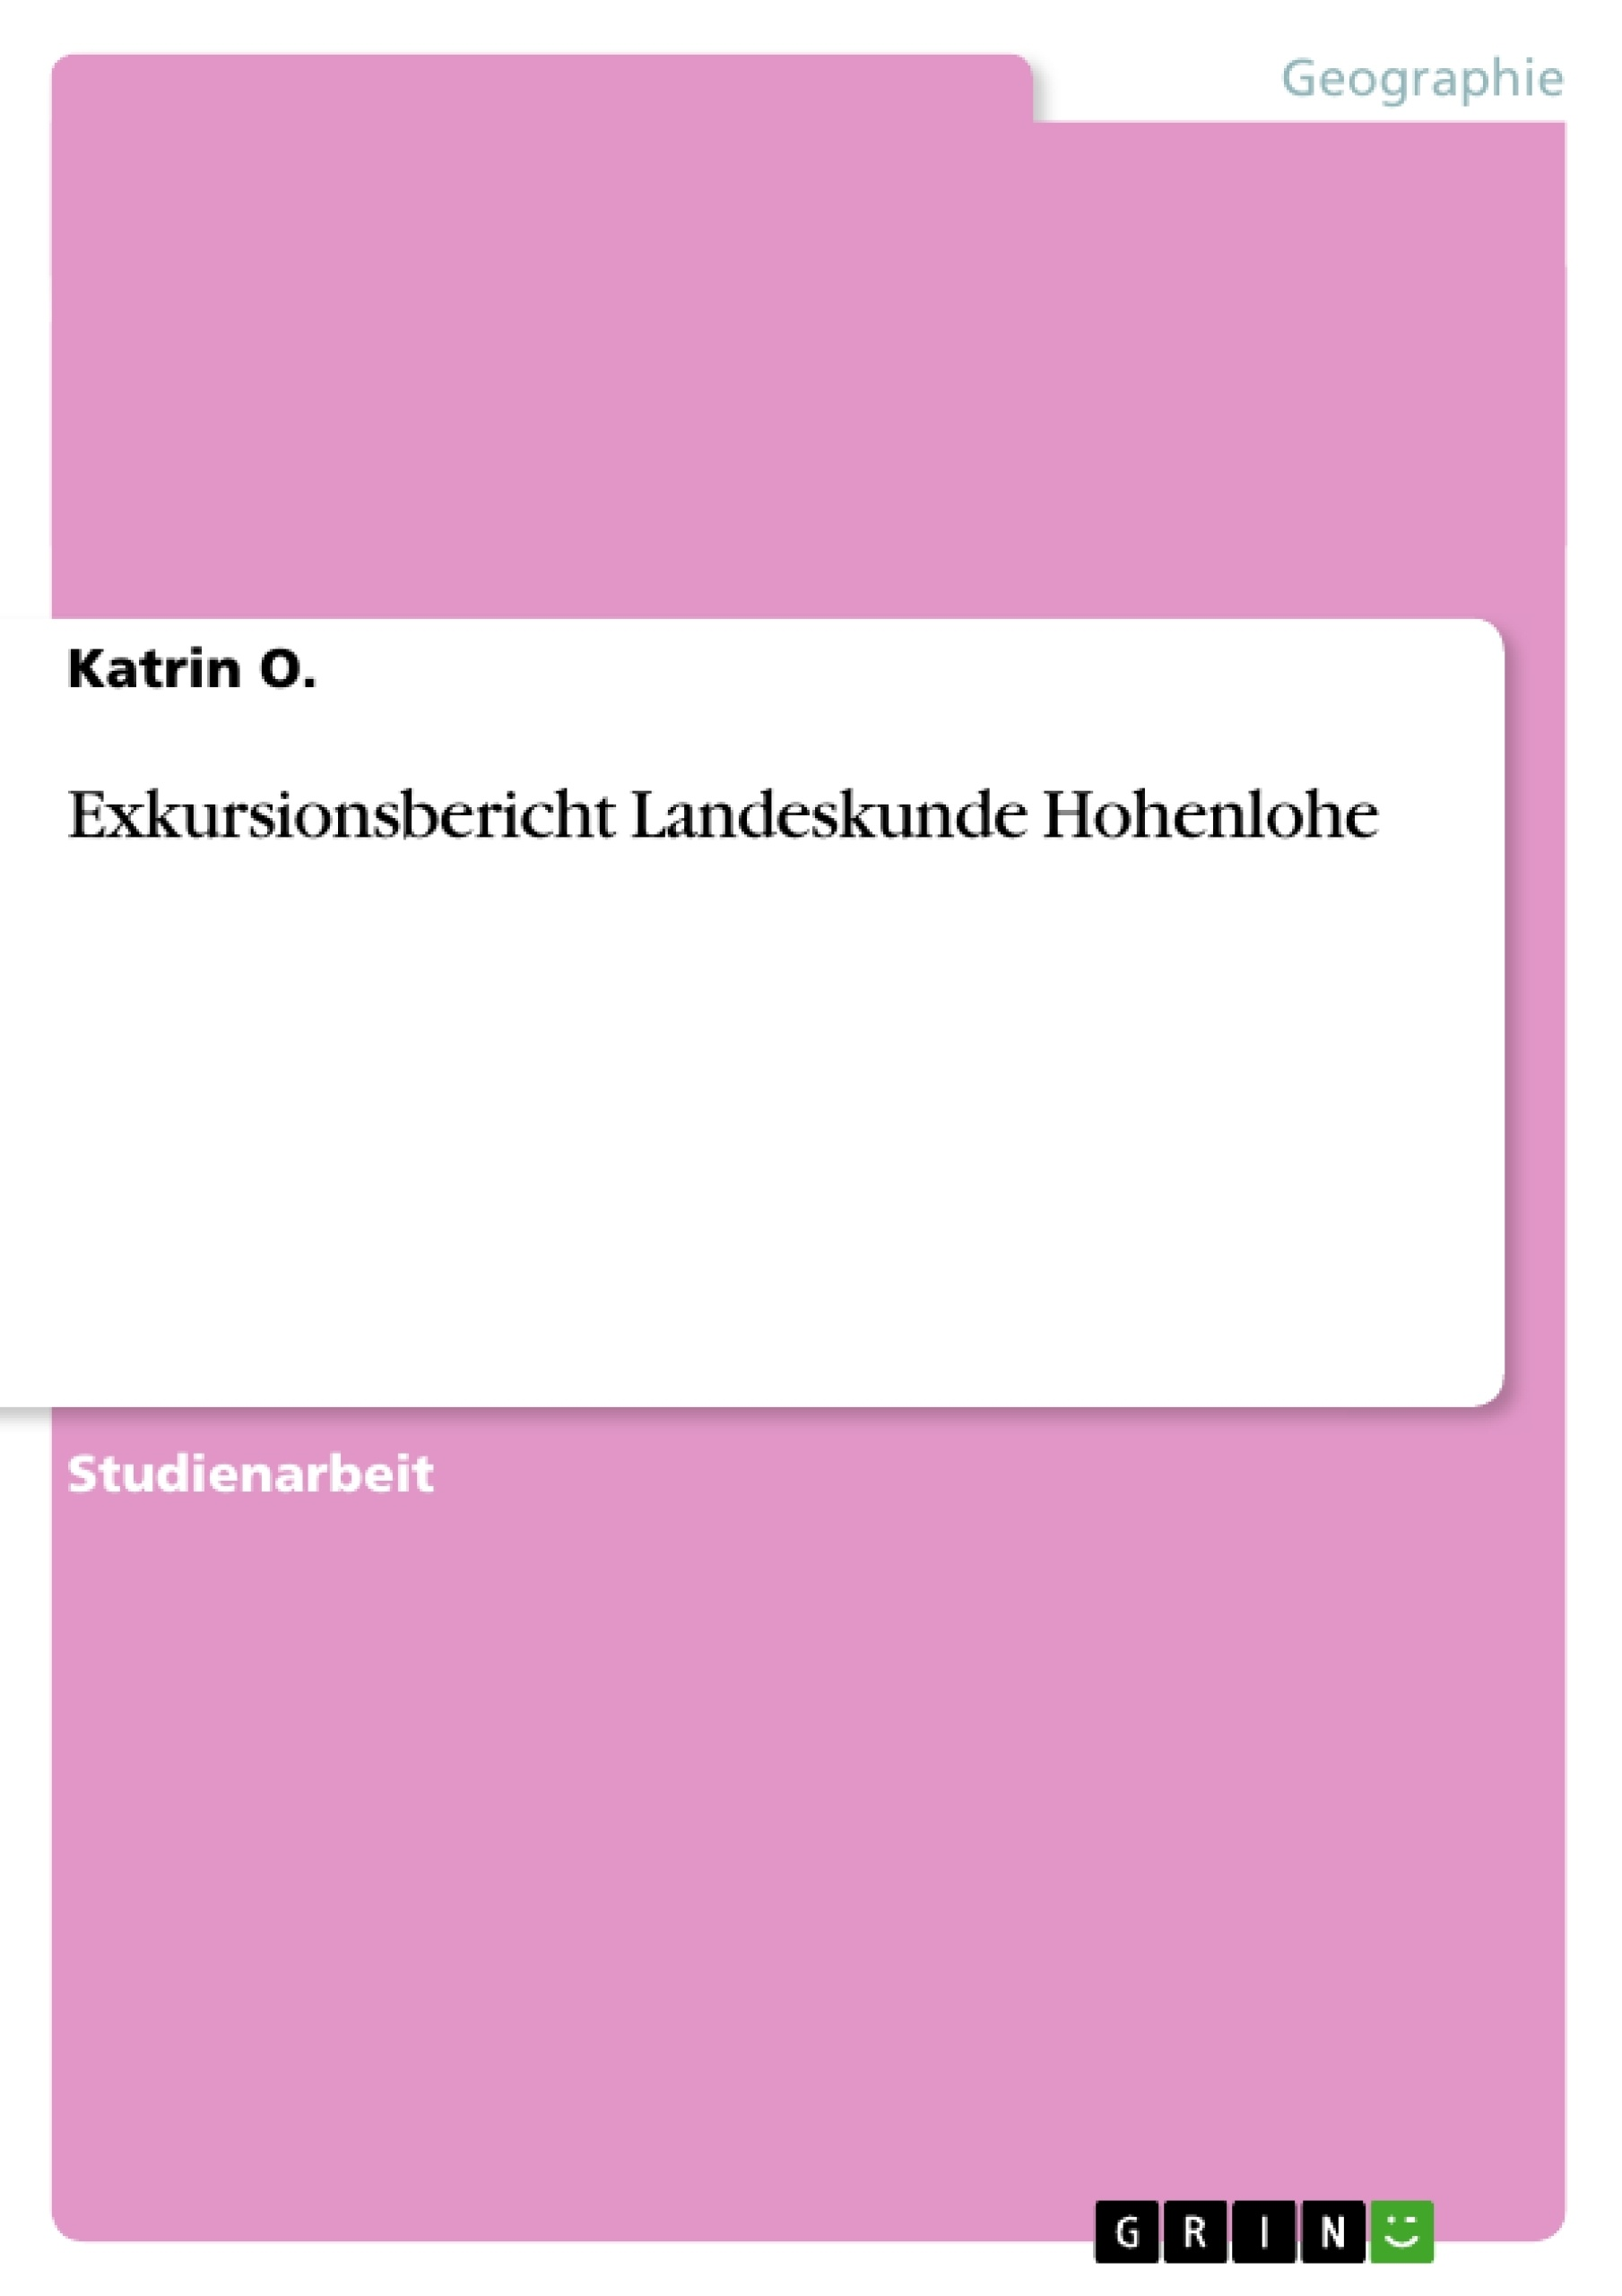 Titel: Exkursionsbericht Landeskunde Hohenlohe